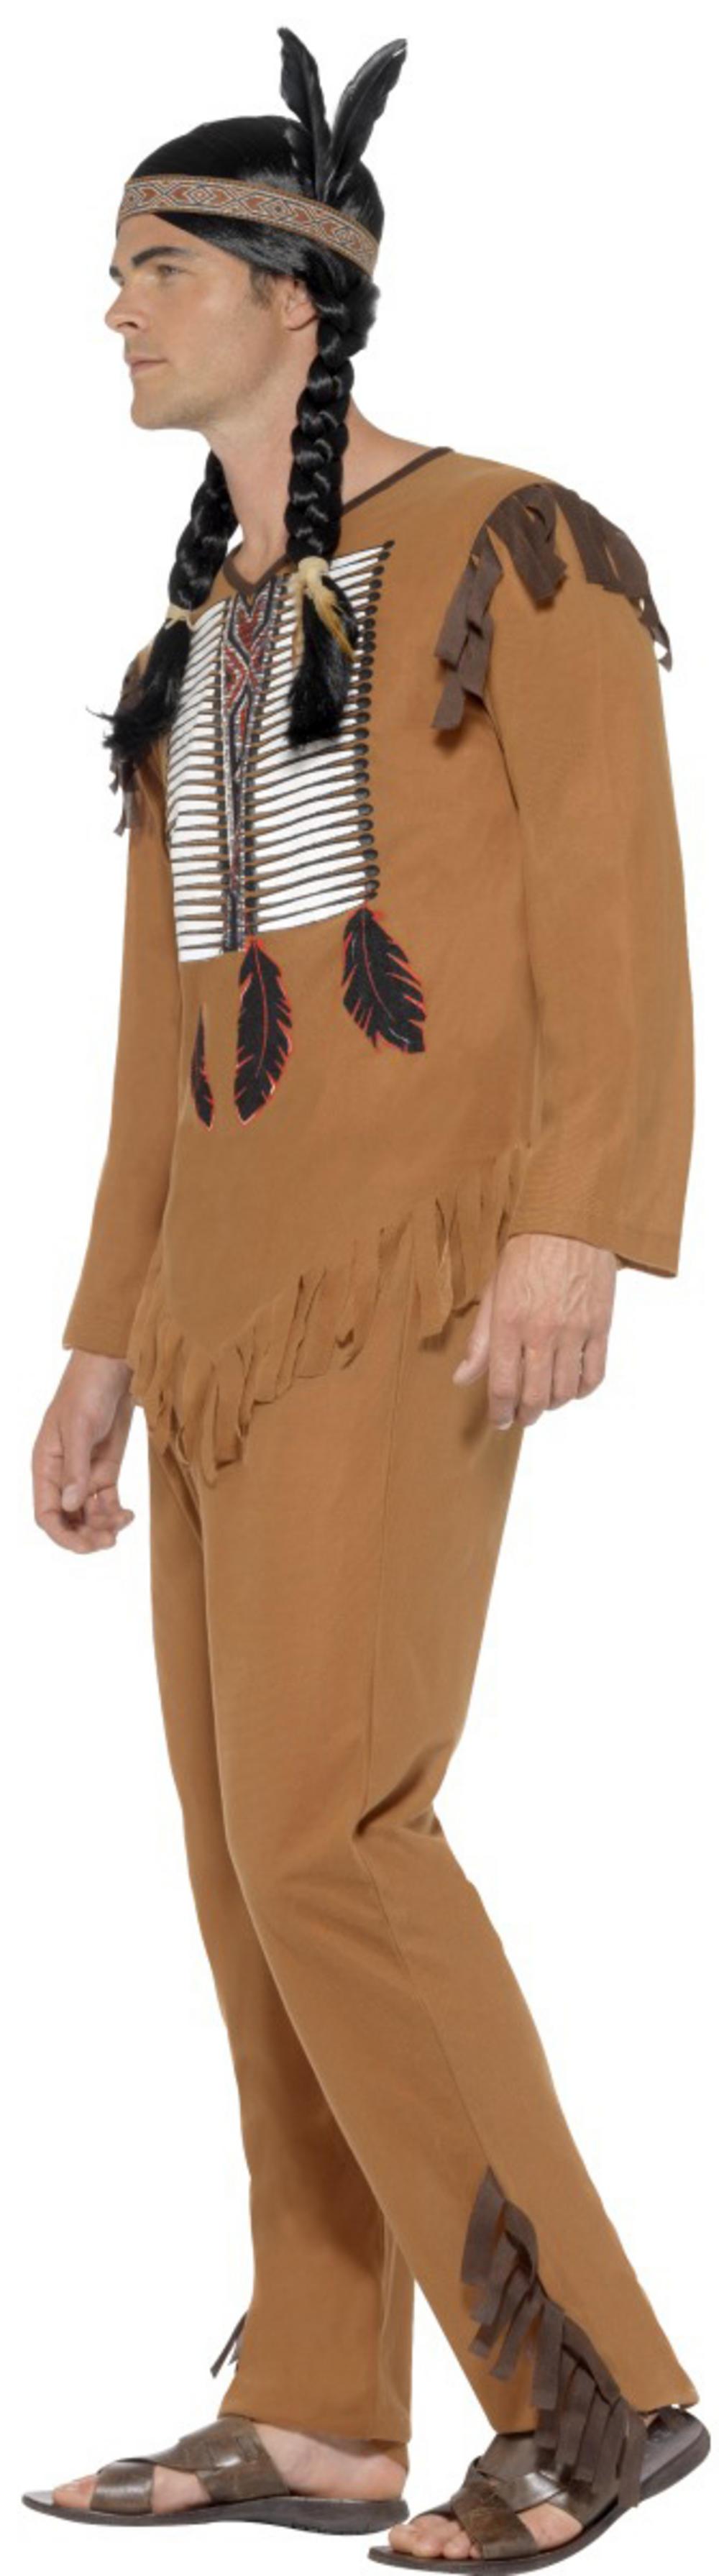 Native American Inspired Warrior Mens Costume | Letter u0026quot;Iu0026quot; Costumes | Mega Fancy Dress